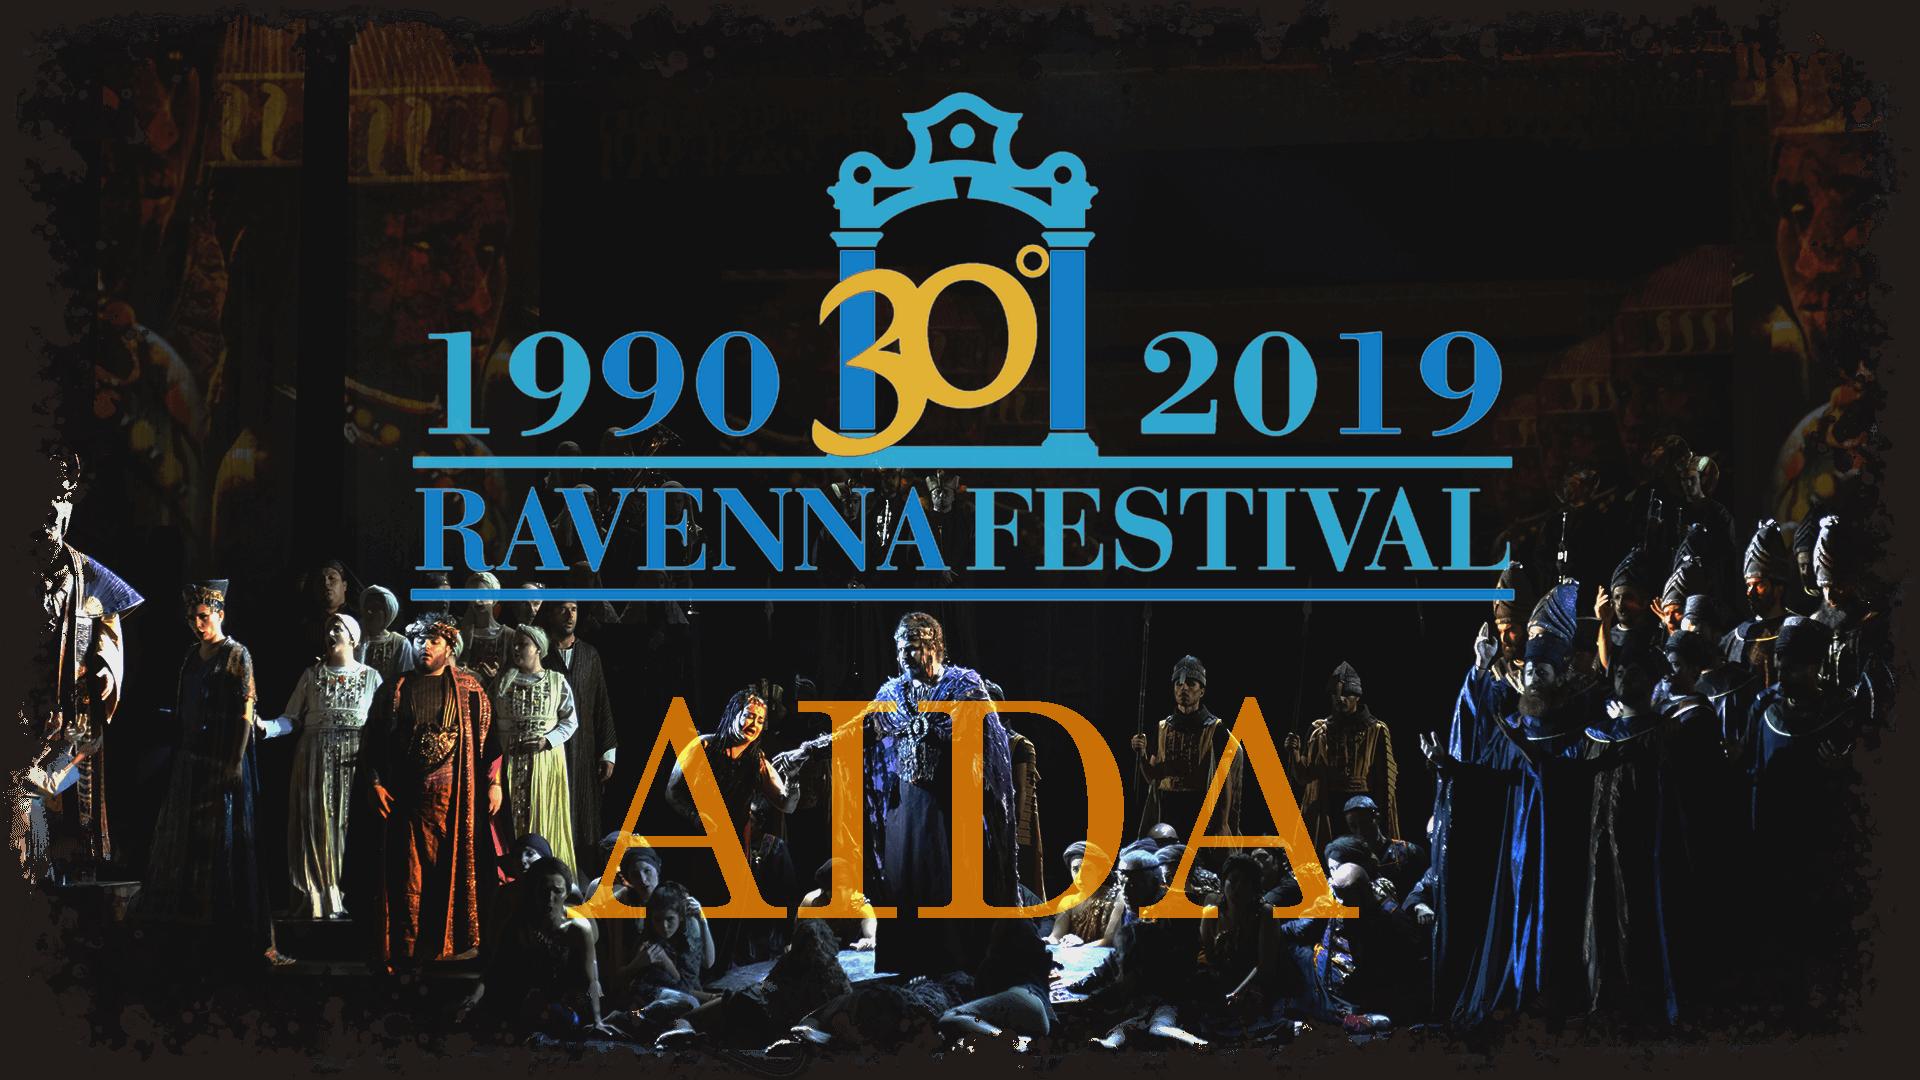 Opera Aida al Ravenna Festival 2019